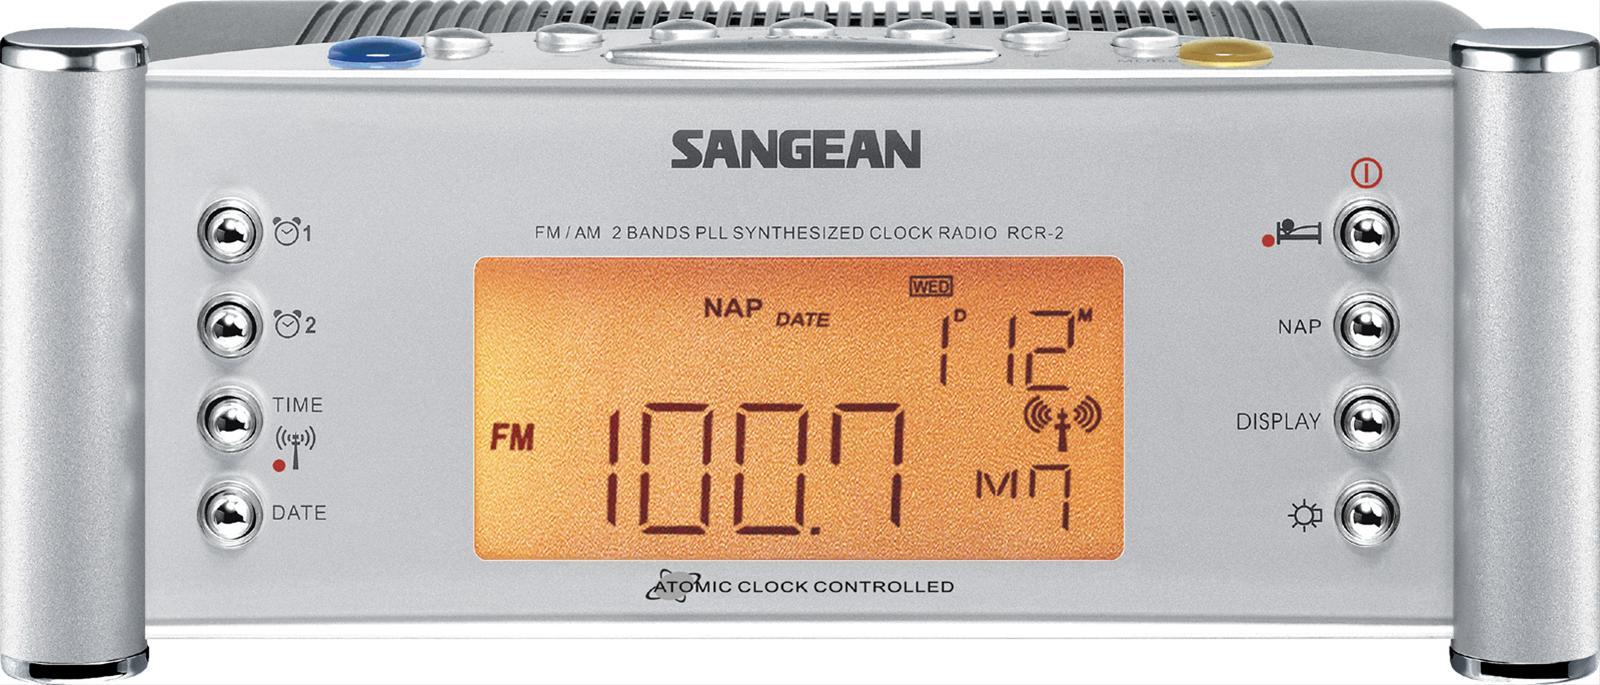 Sangean RCR 2 Clock Radios